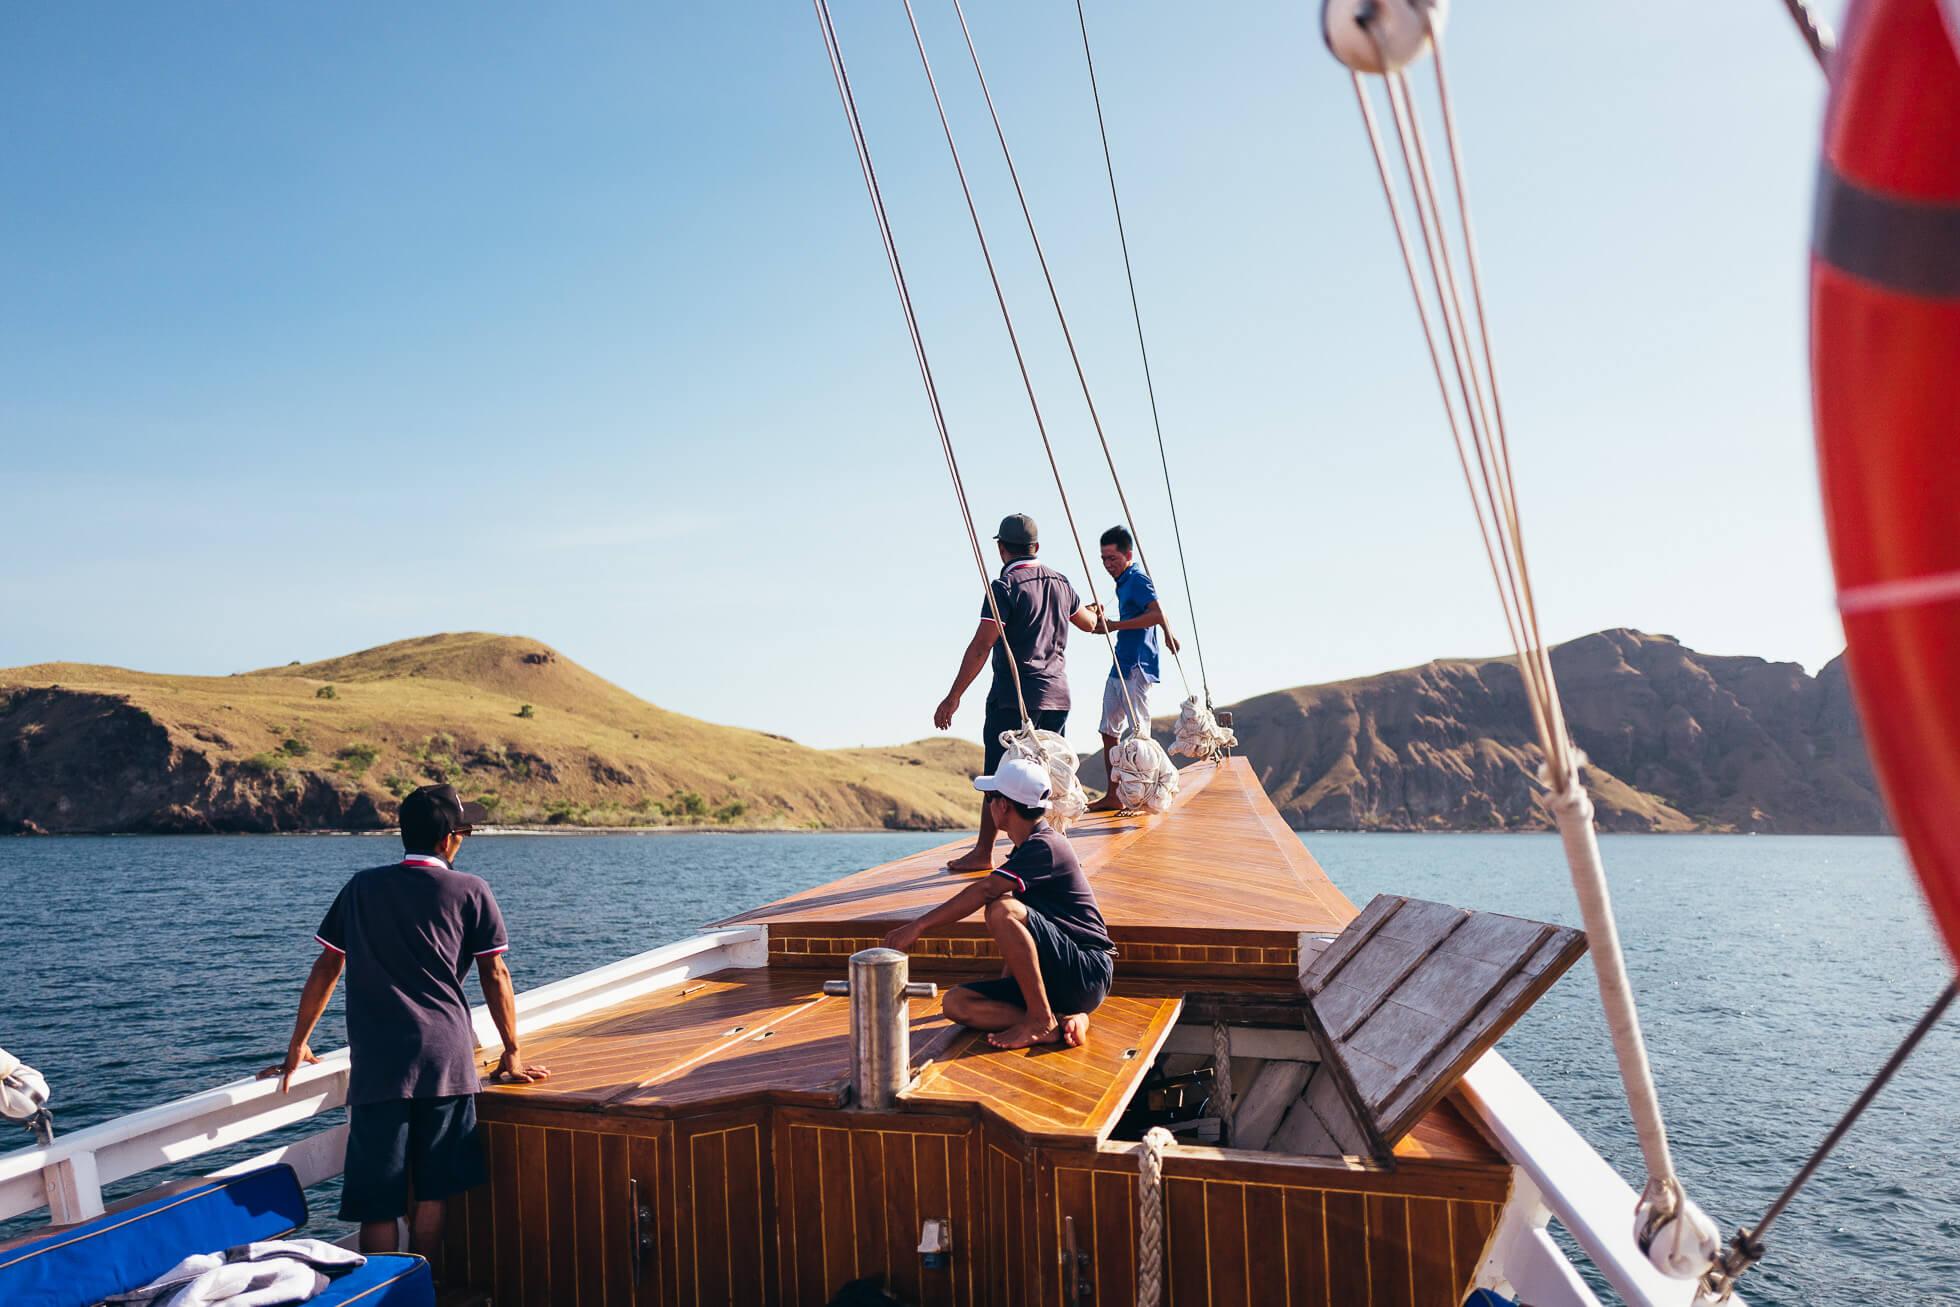 janni-deler-mer-sea-boatL1020236